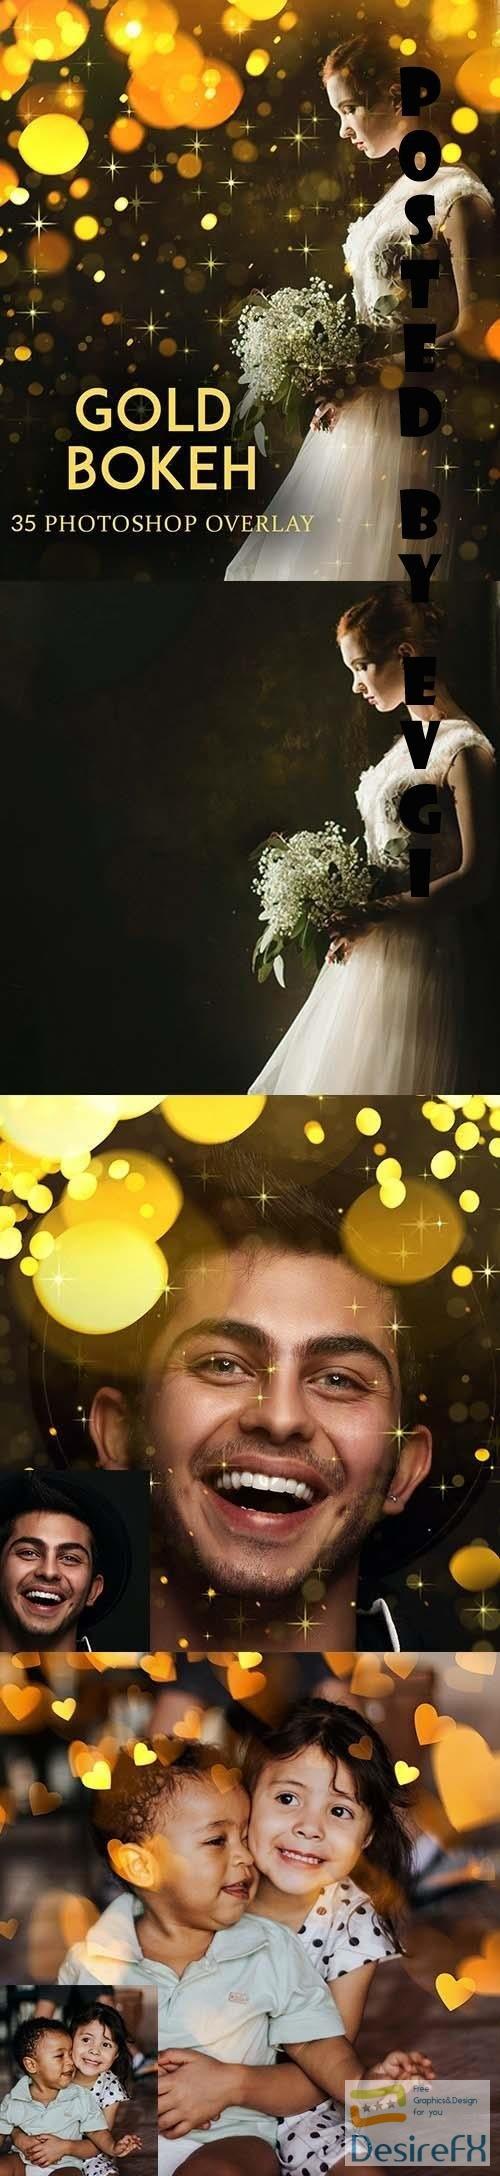 Gold Bokeh Photoshop Overlay Action - 32510865